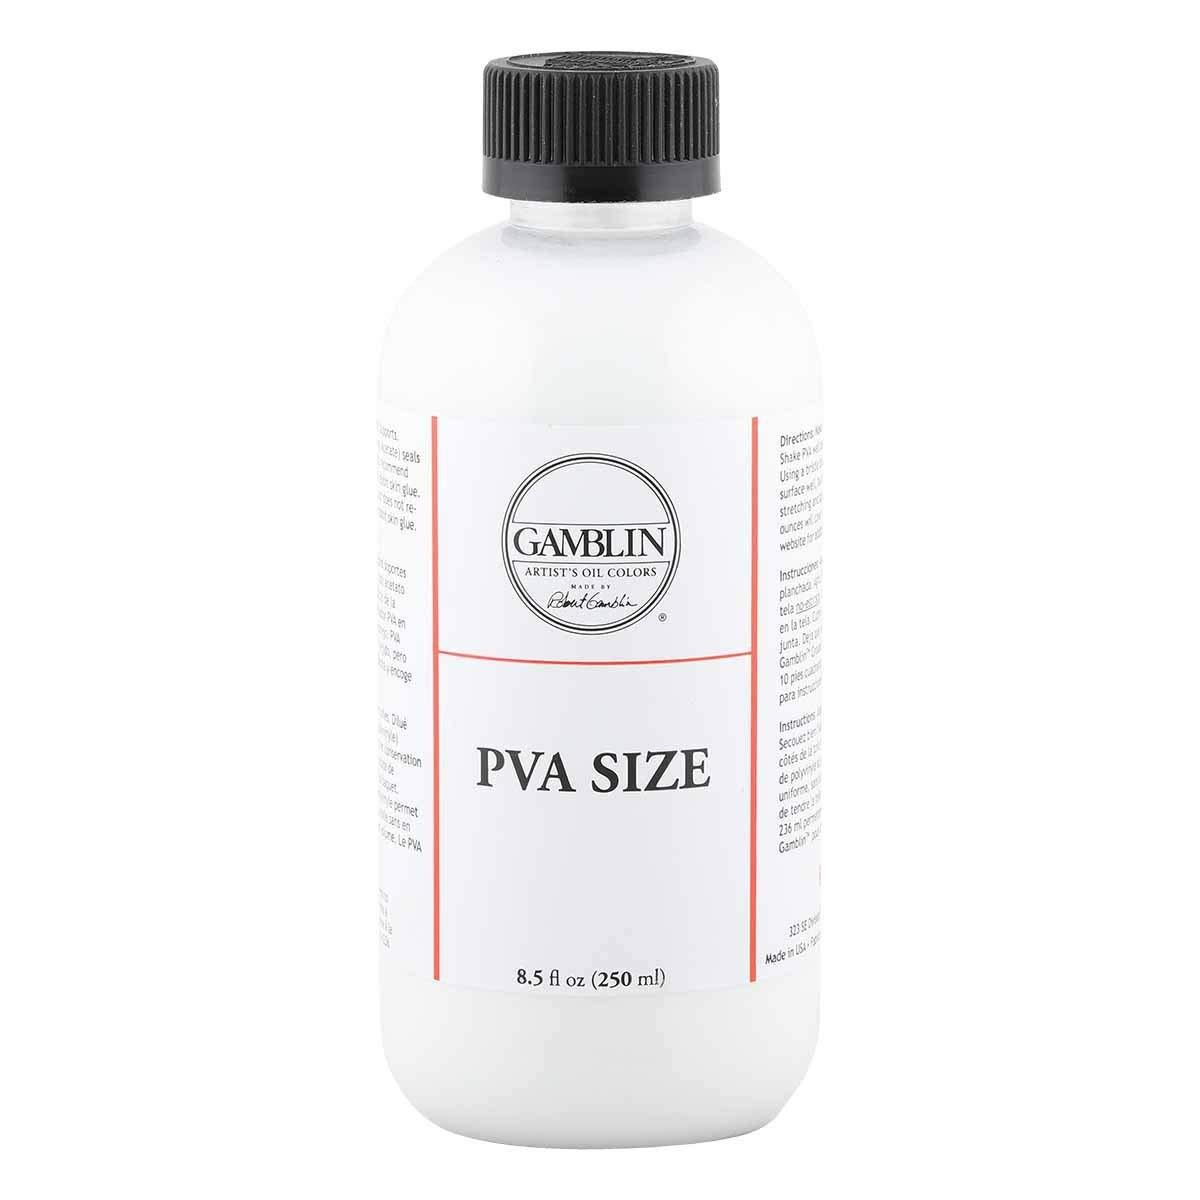 Poly Vinyl Acetate Size: 8.5 oz